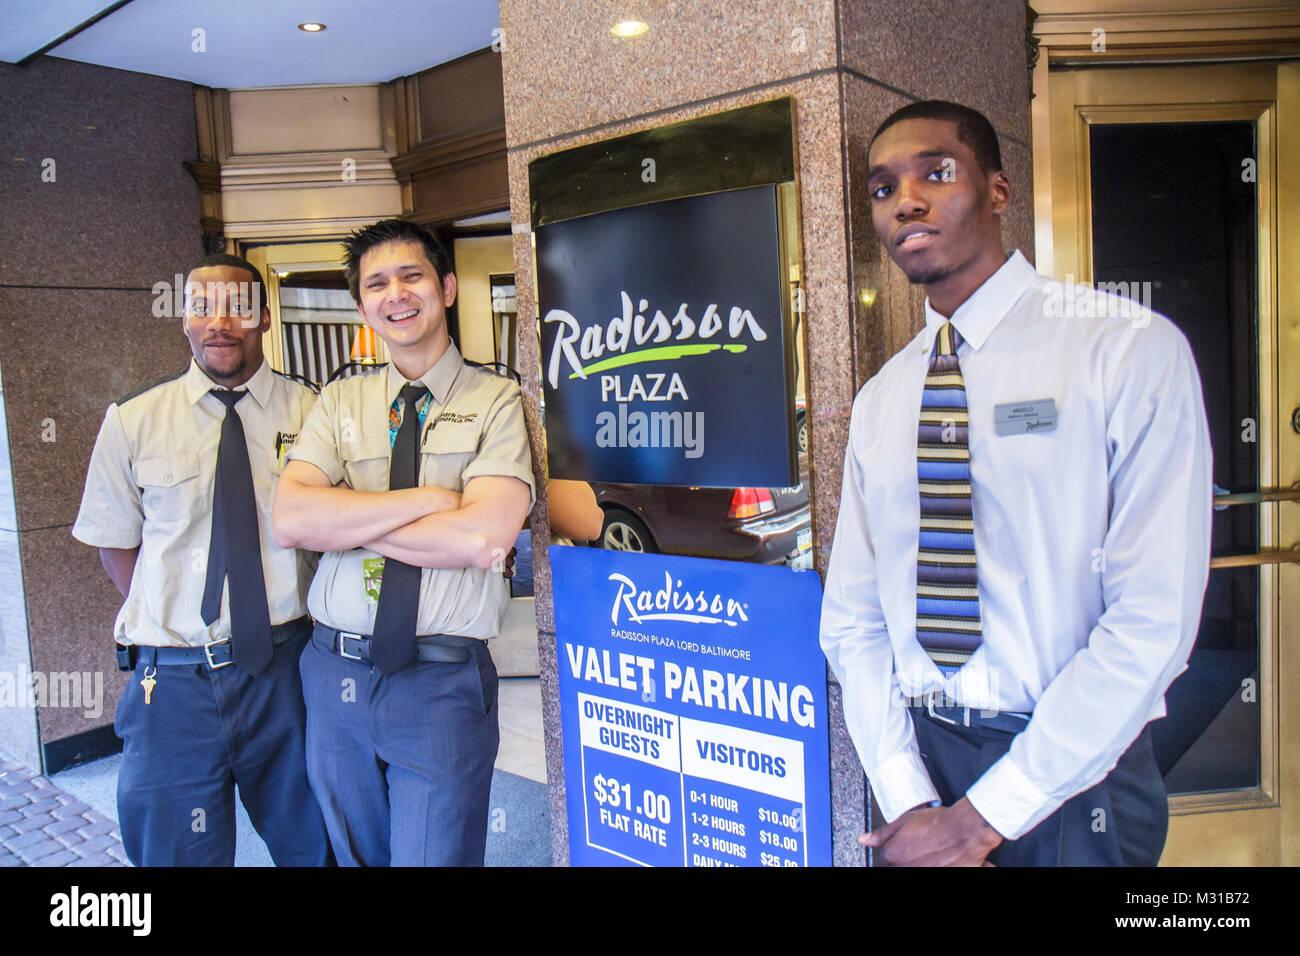 Baltimore Maryland Radisson Plaza Lord Baltimore Hotel global company business lodging Black man job employee parking - Stock Image